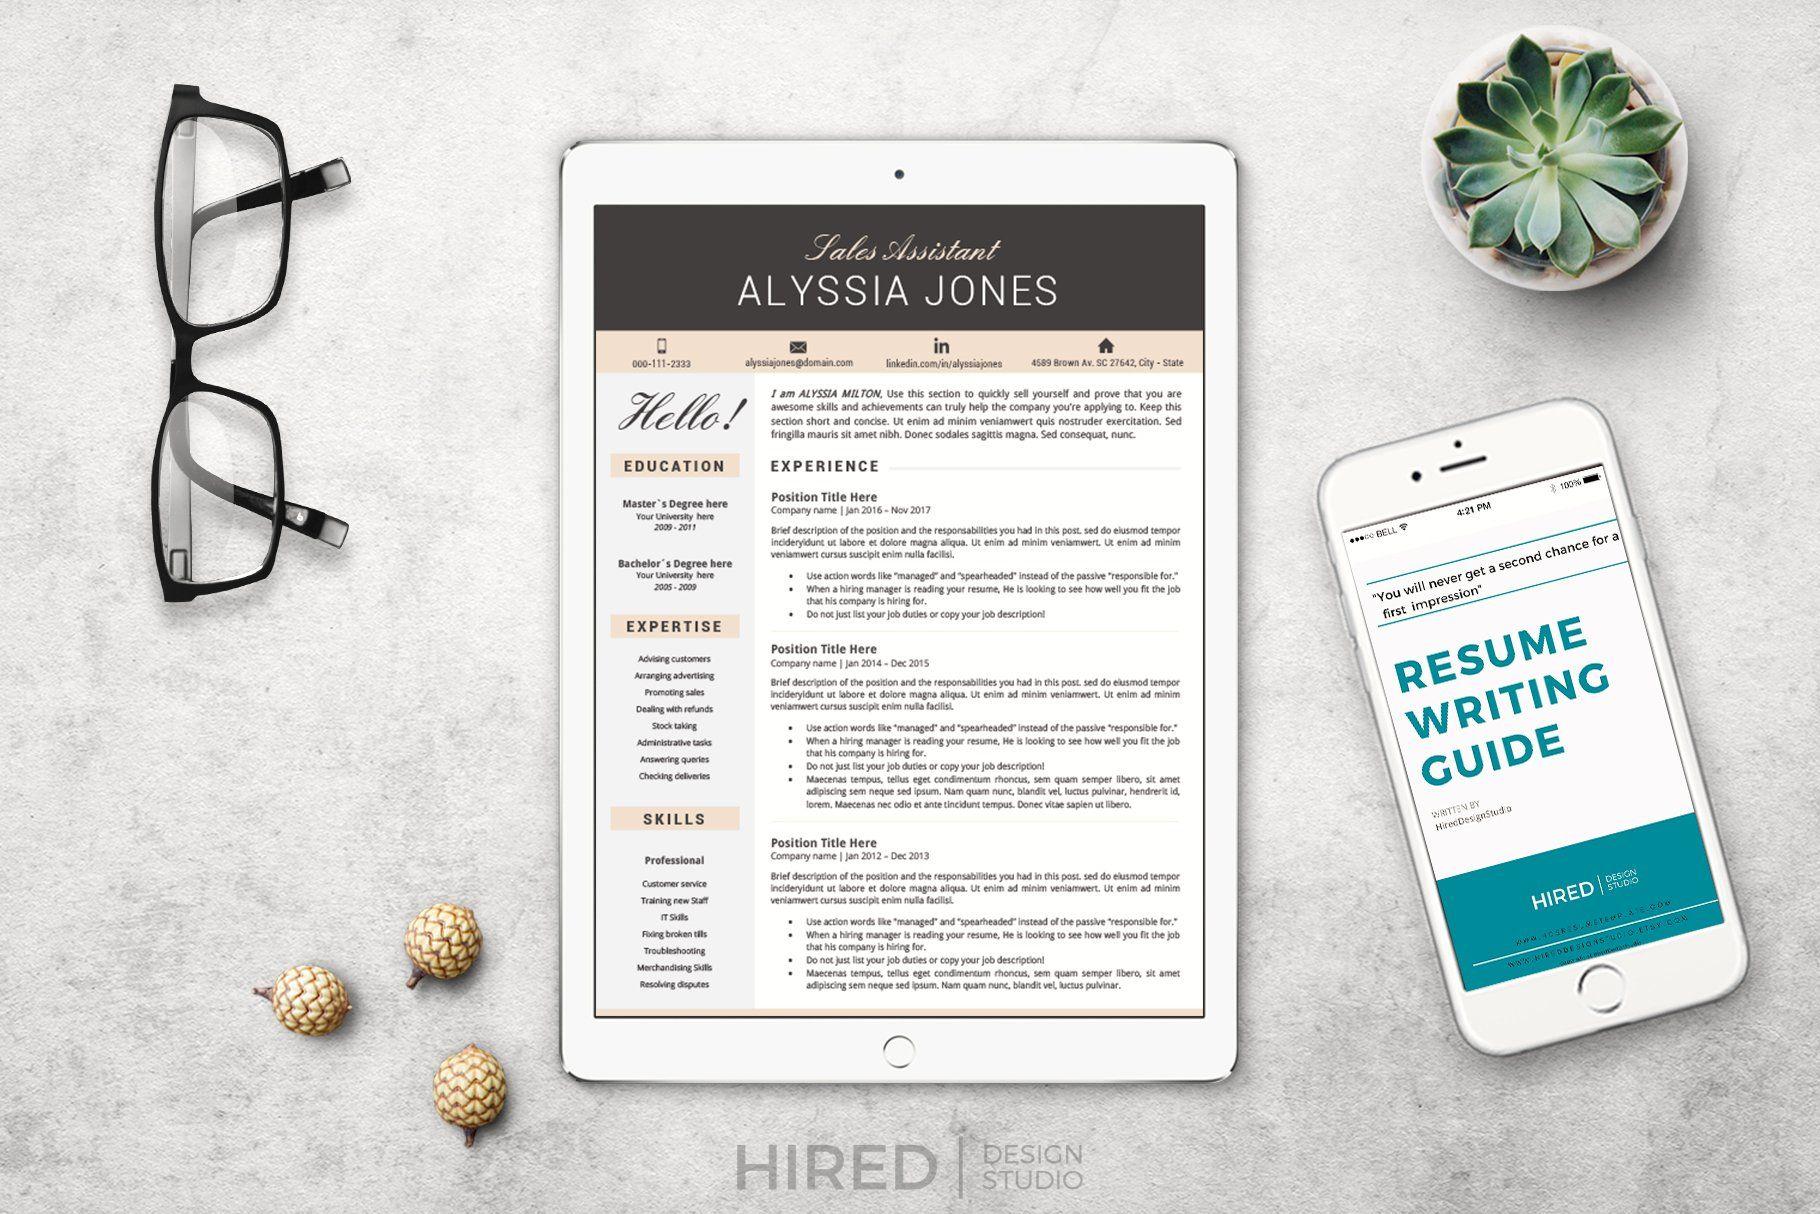 Sales assistant resume cv template nursing resume